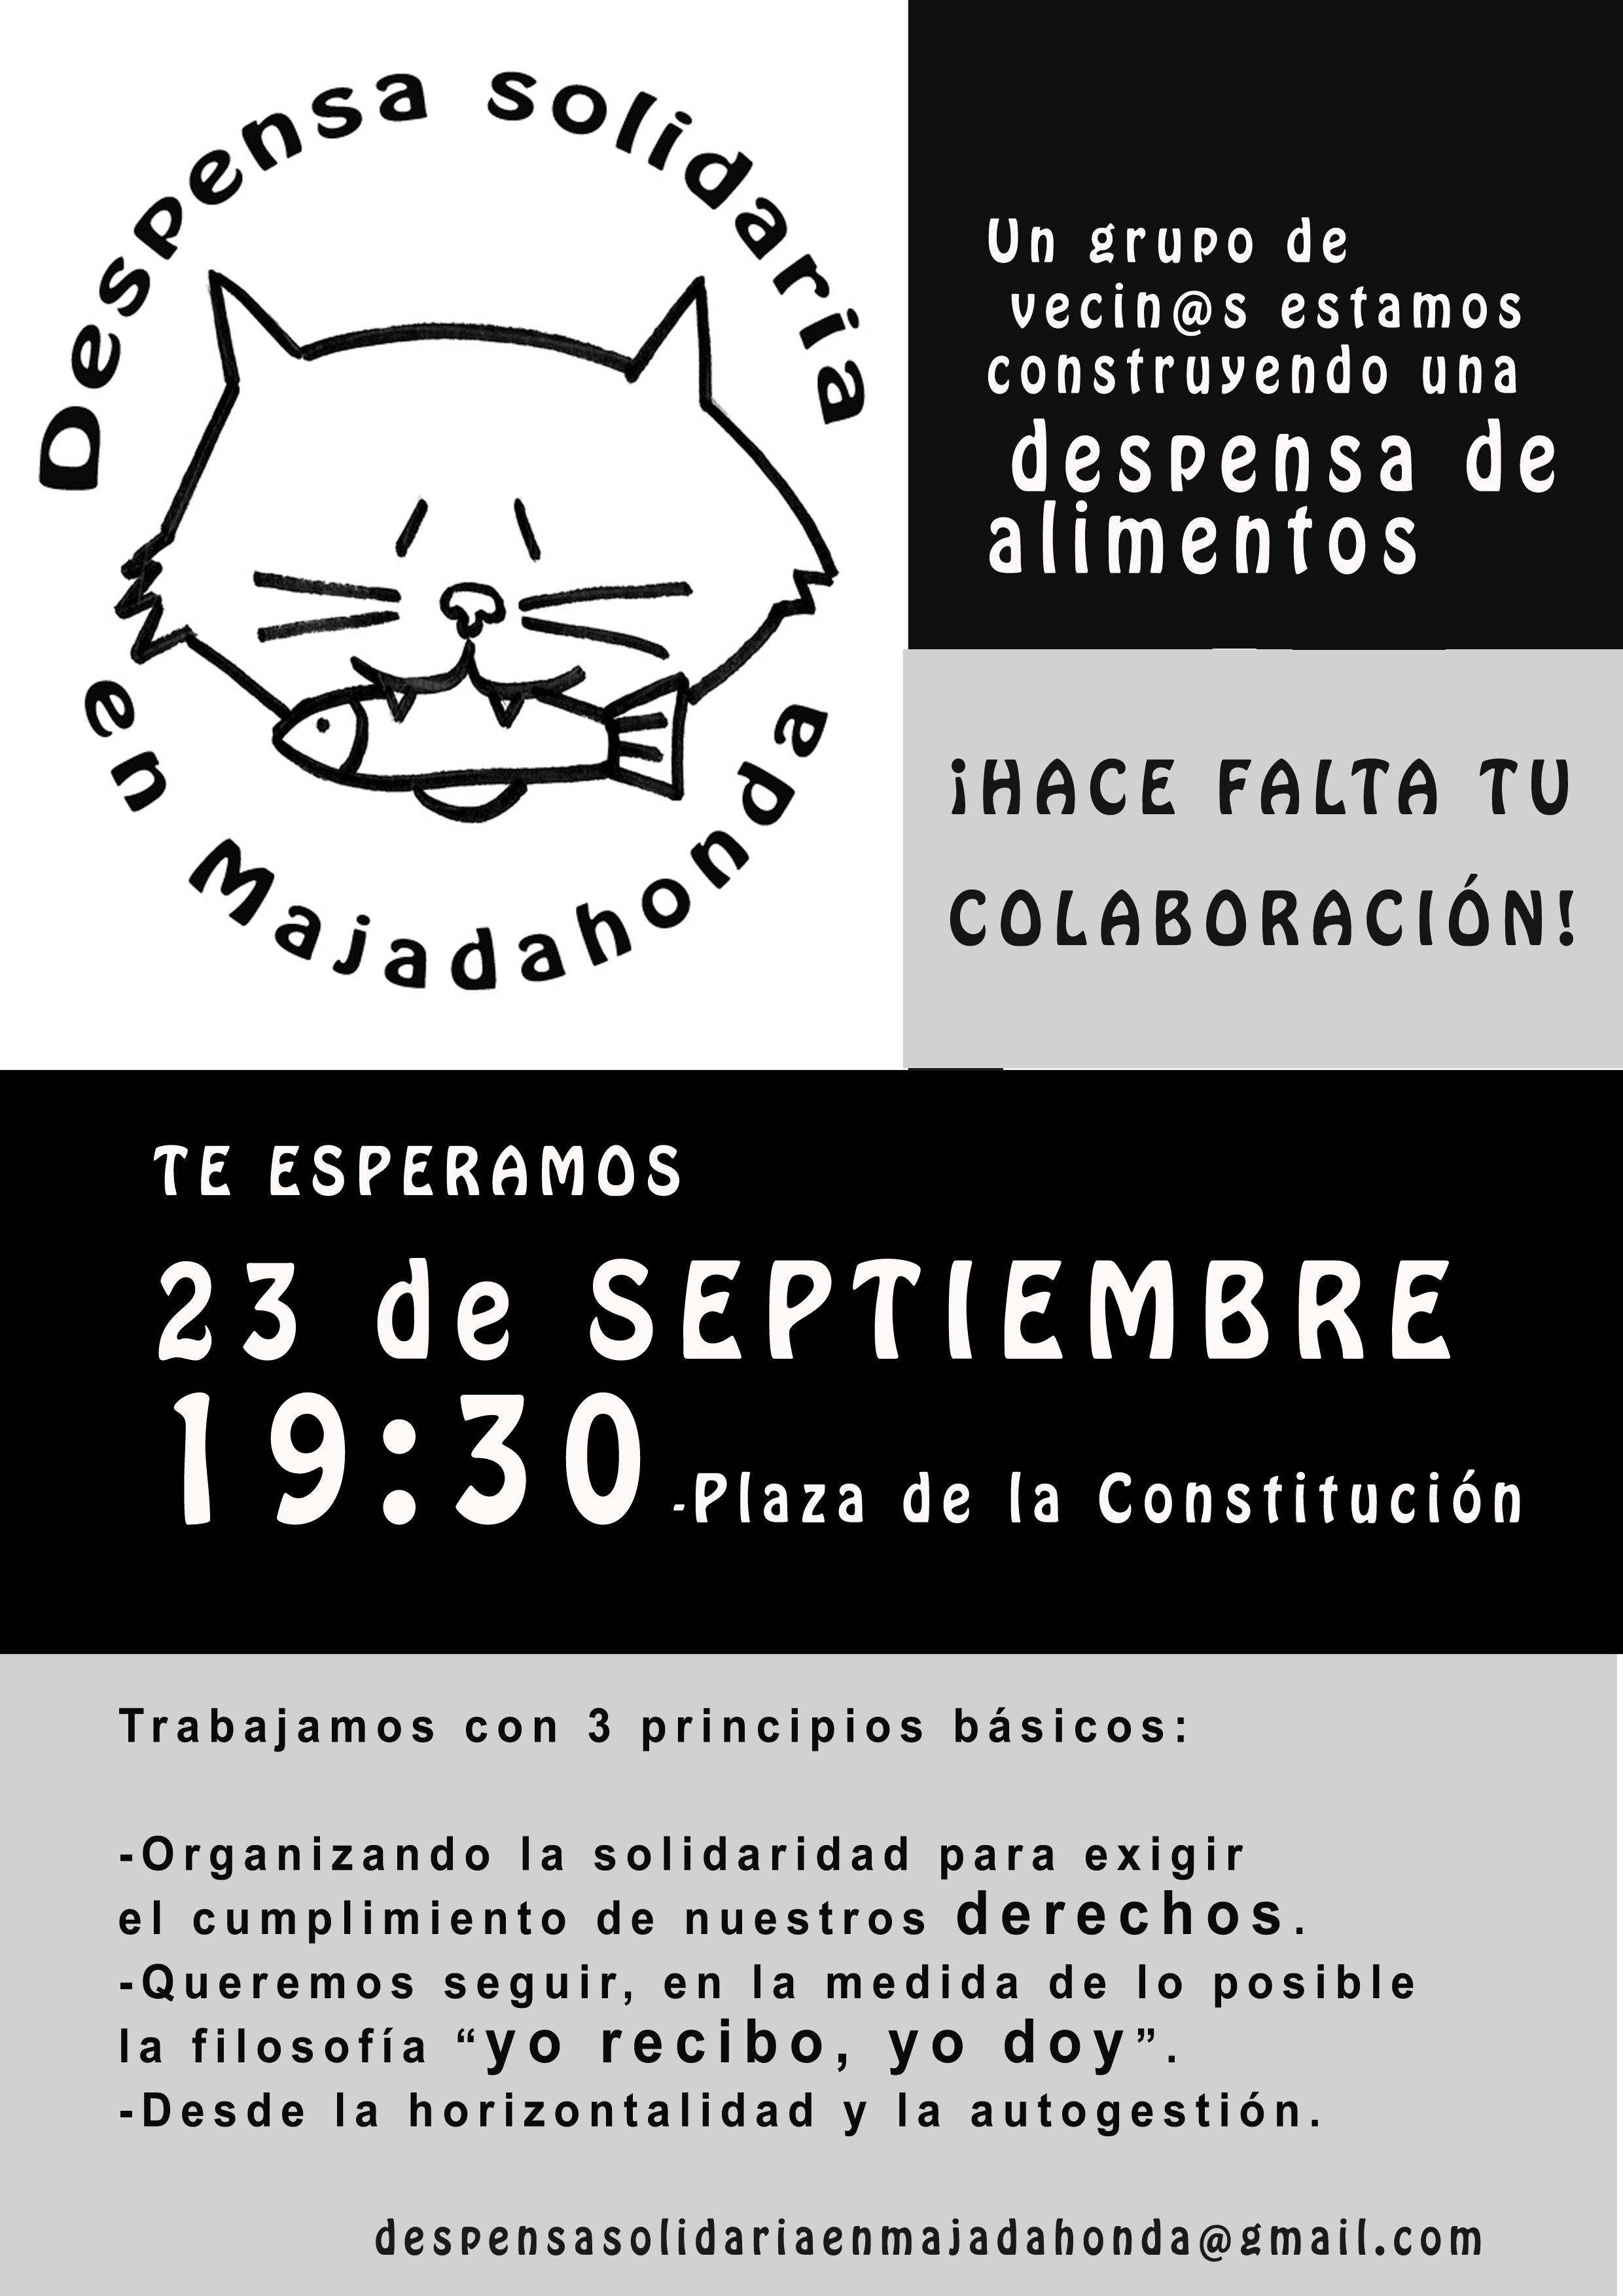 Cartel Despensa solidaria corto copia (1)